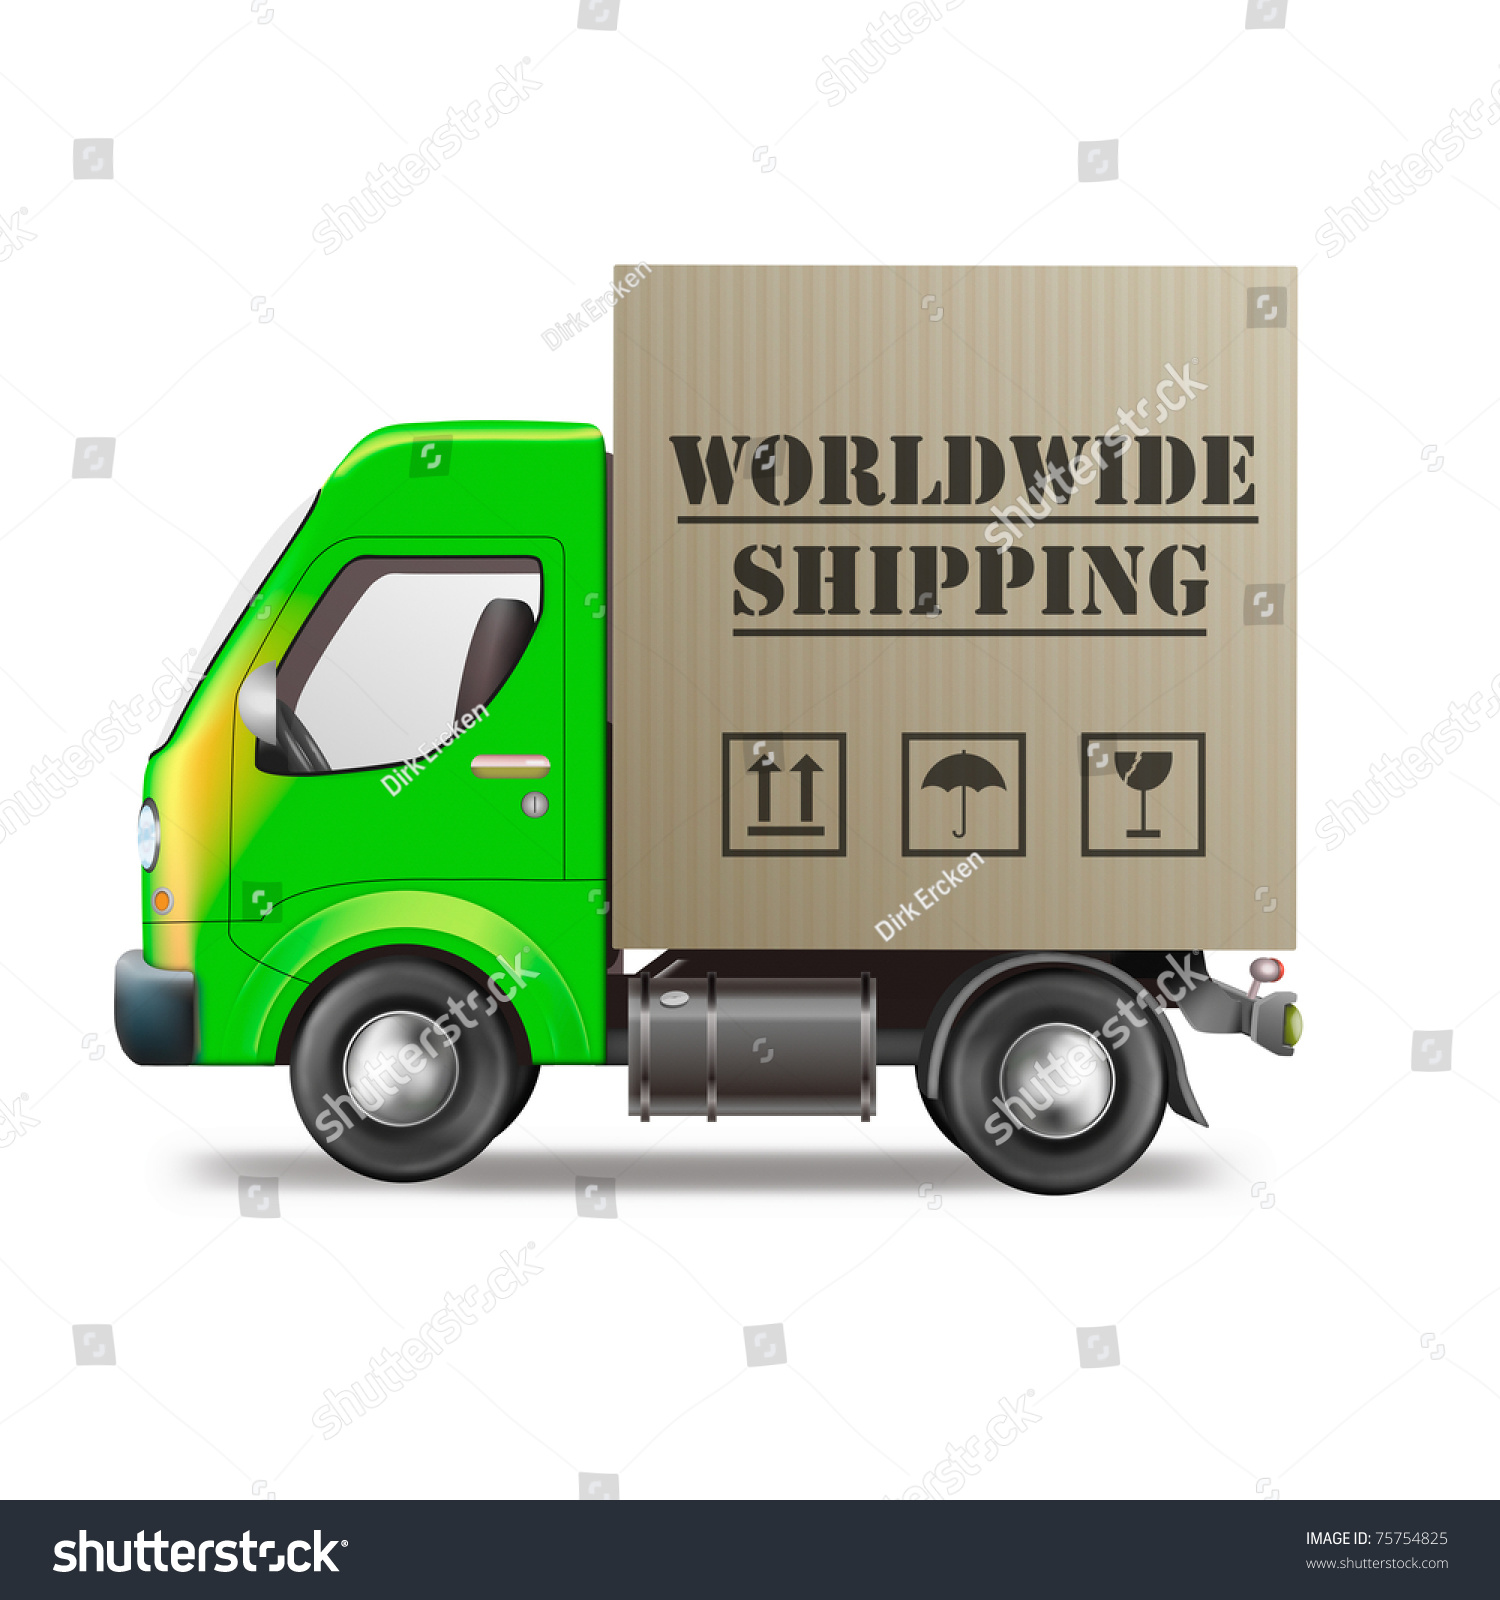 Worldwide Shipping Online Internet Order Web Stock Illustration ...